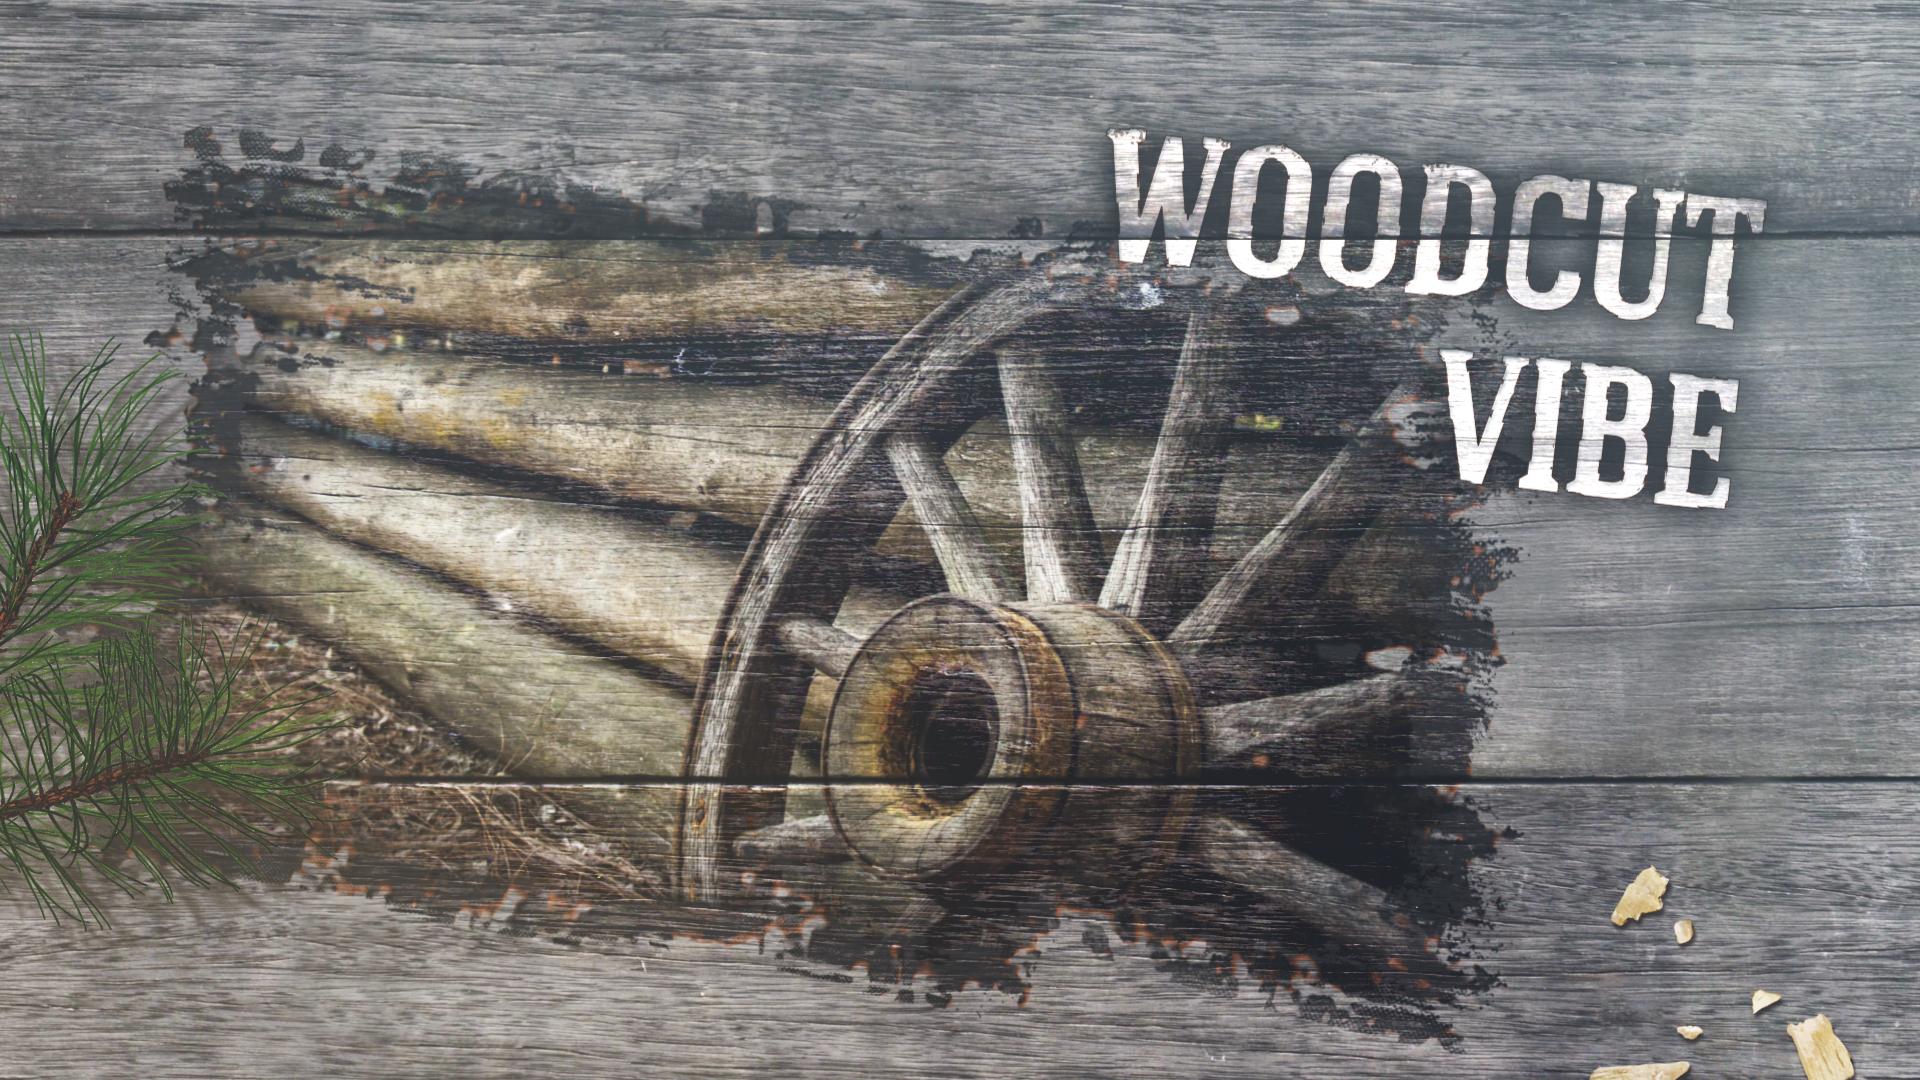 Woodcut_Rustic_Slideshow_1080p_00240